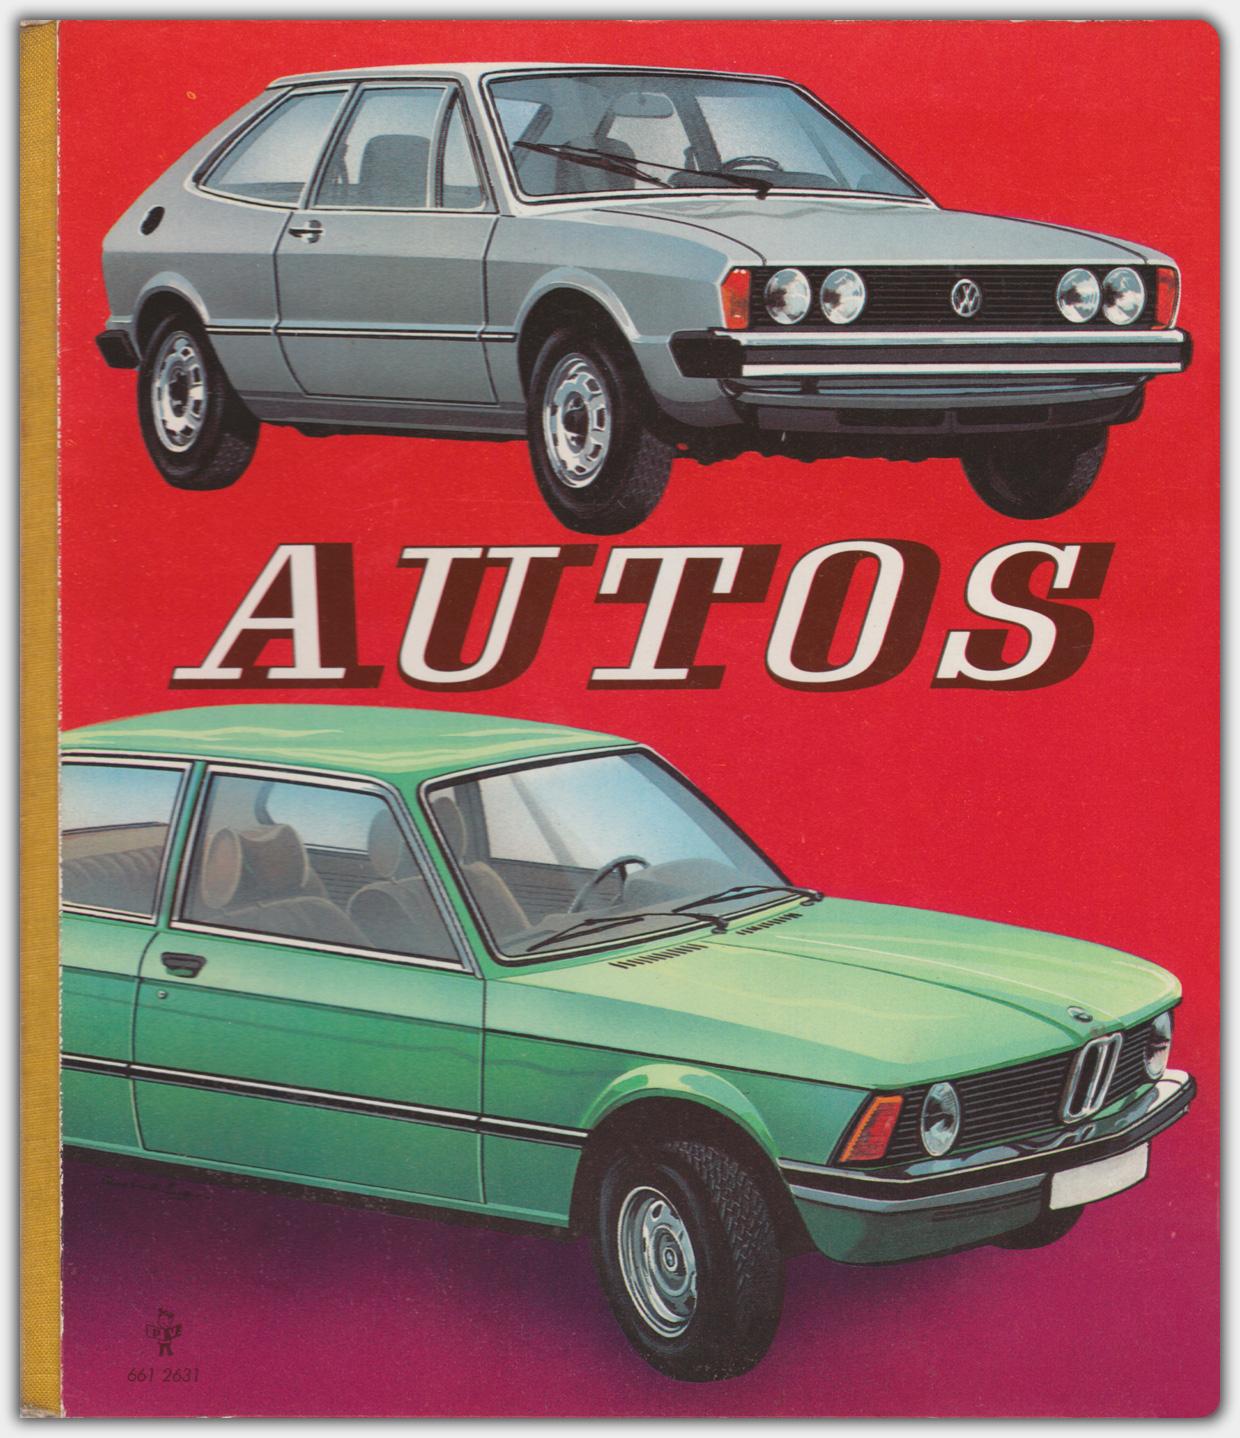 Autos | Pestalozzi Verlag | Ausgabe 1977 | Verlagsnummer 661 2631